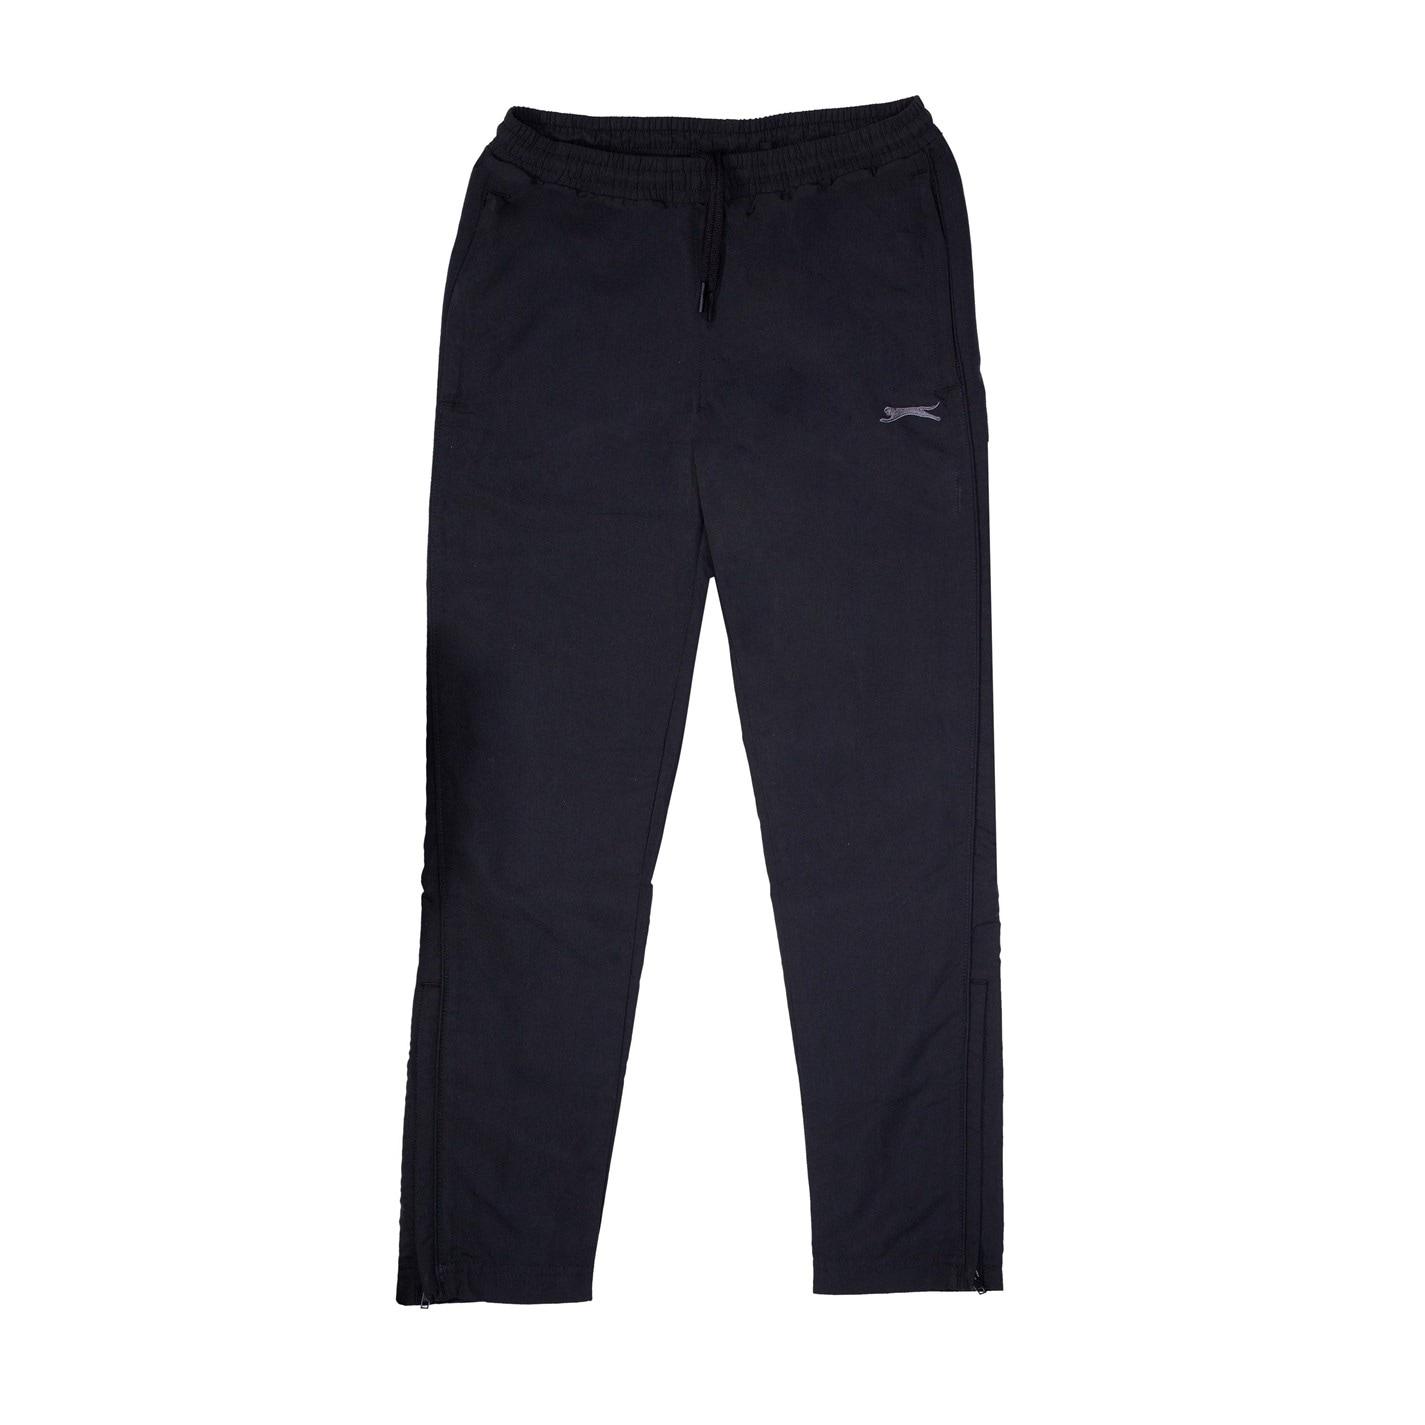 Pantaloni Slazenger fara mansete Woven pentru baietei negru